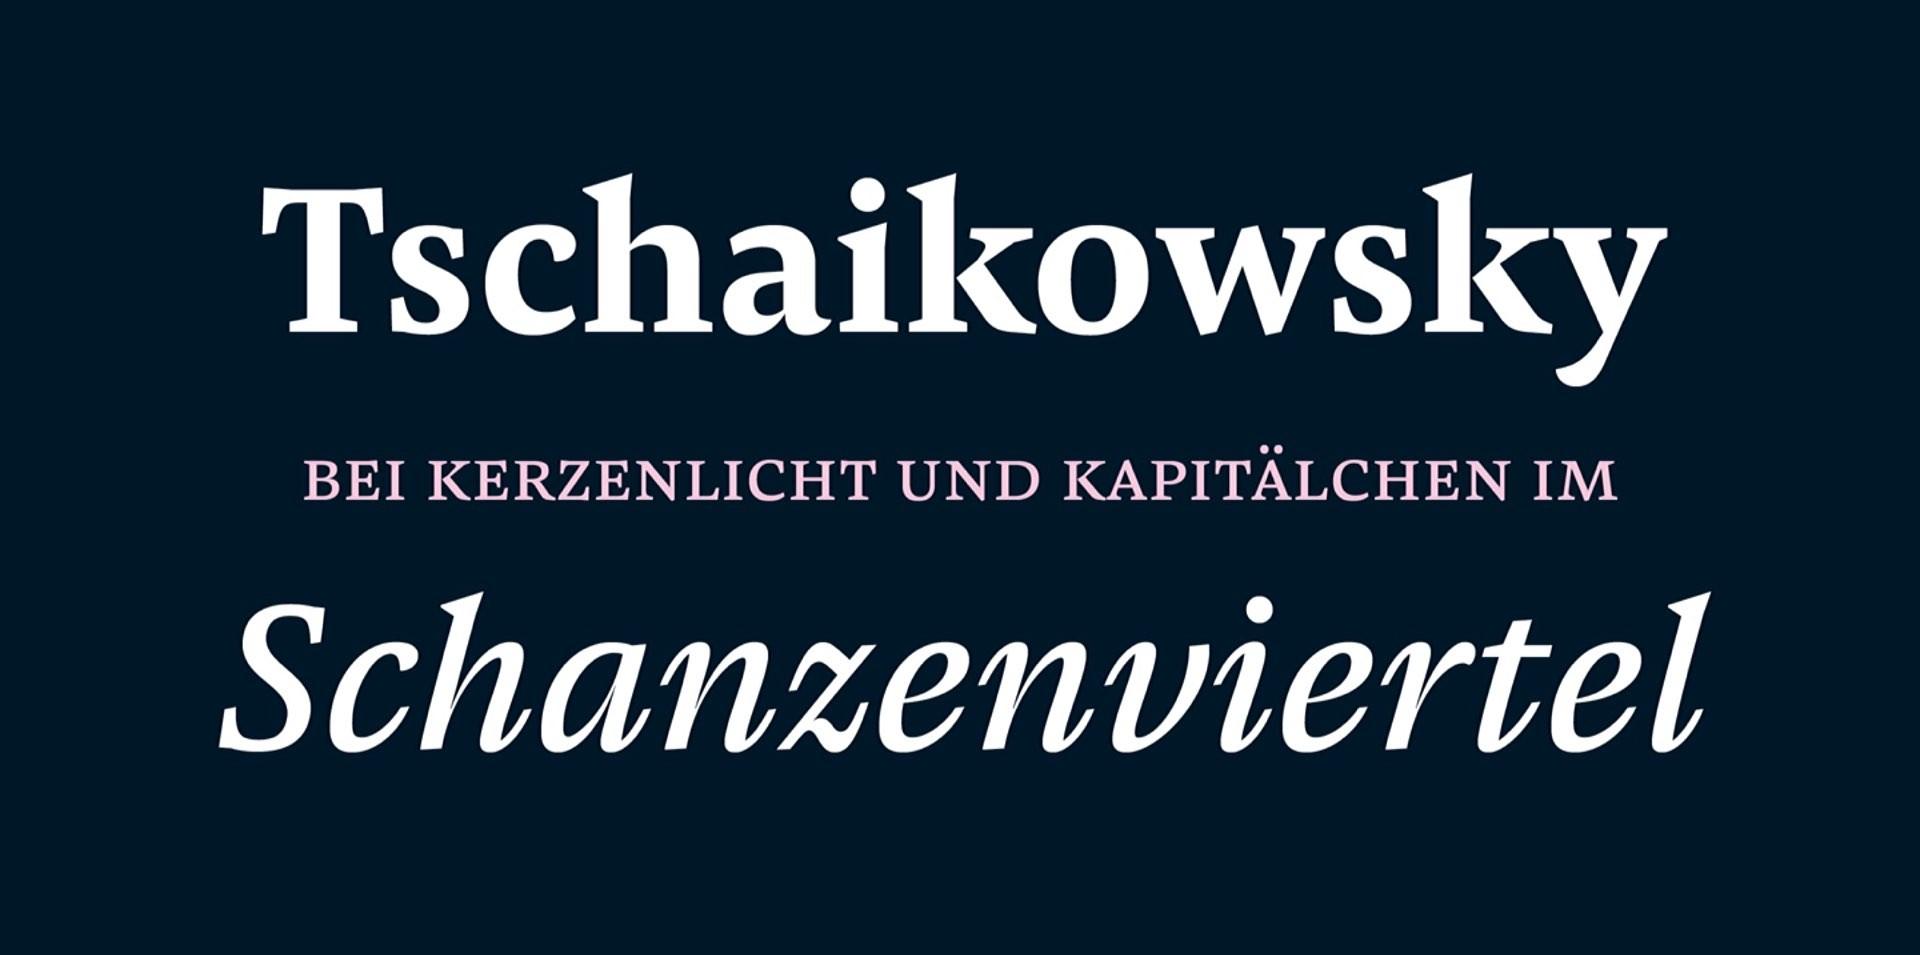 pensum-pro-typeface-by-nils-thomsen-2